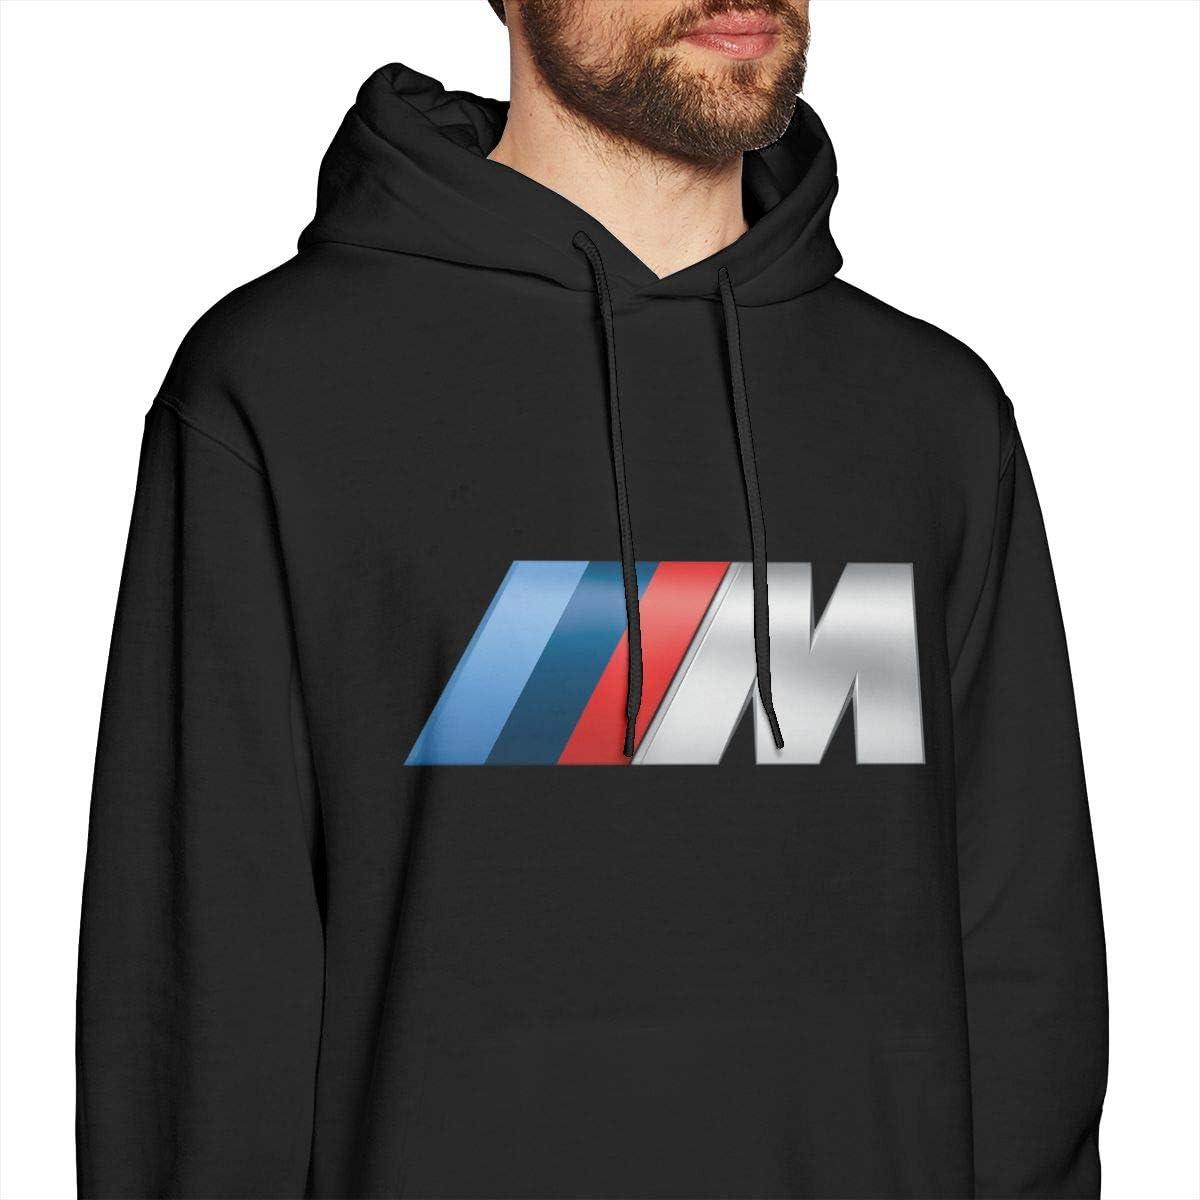 C-JOY M-Logo Mens Hoodies Pullover Hooded Sweatshirt Jackets Black